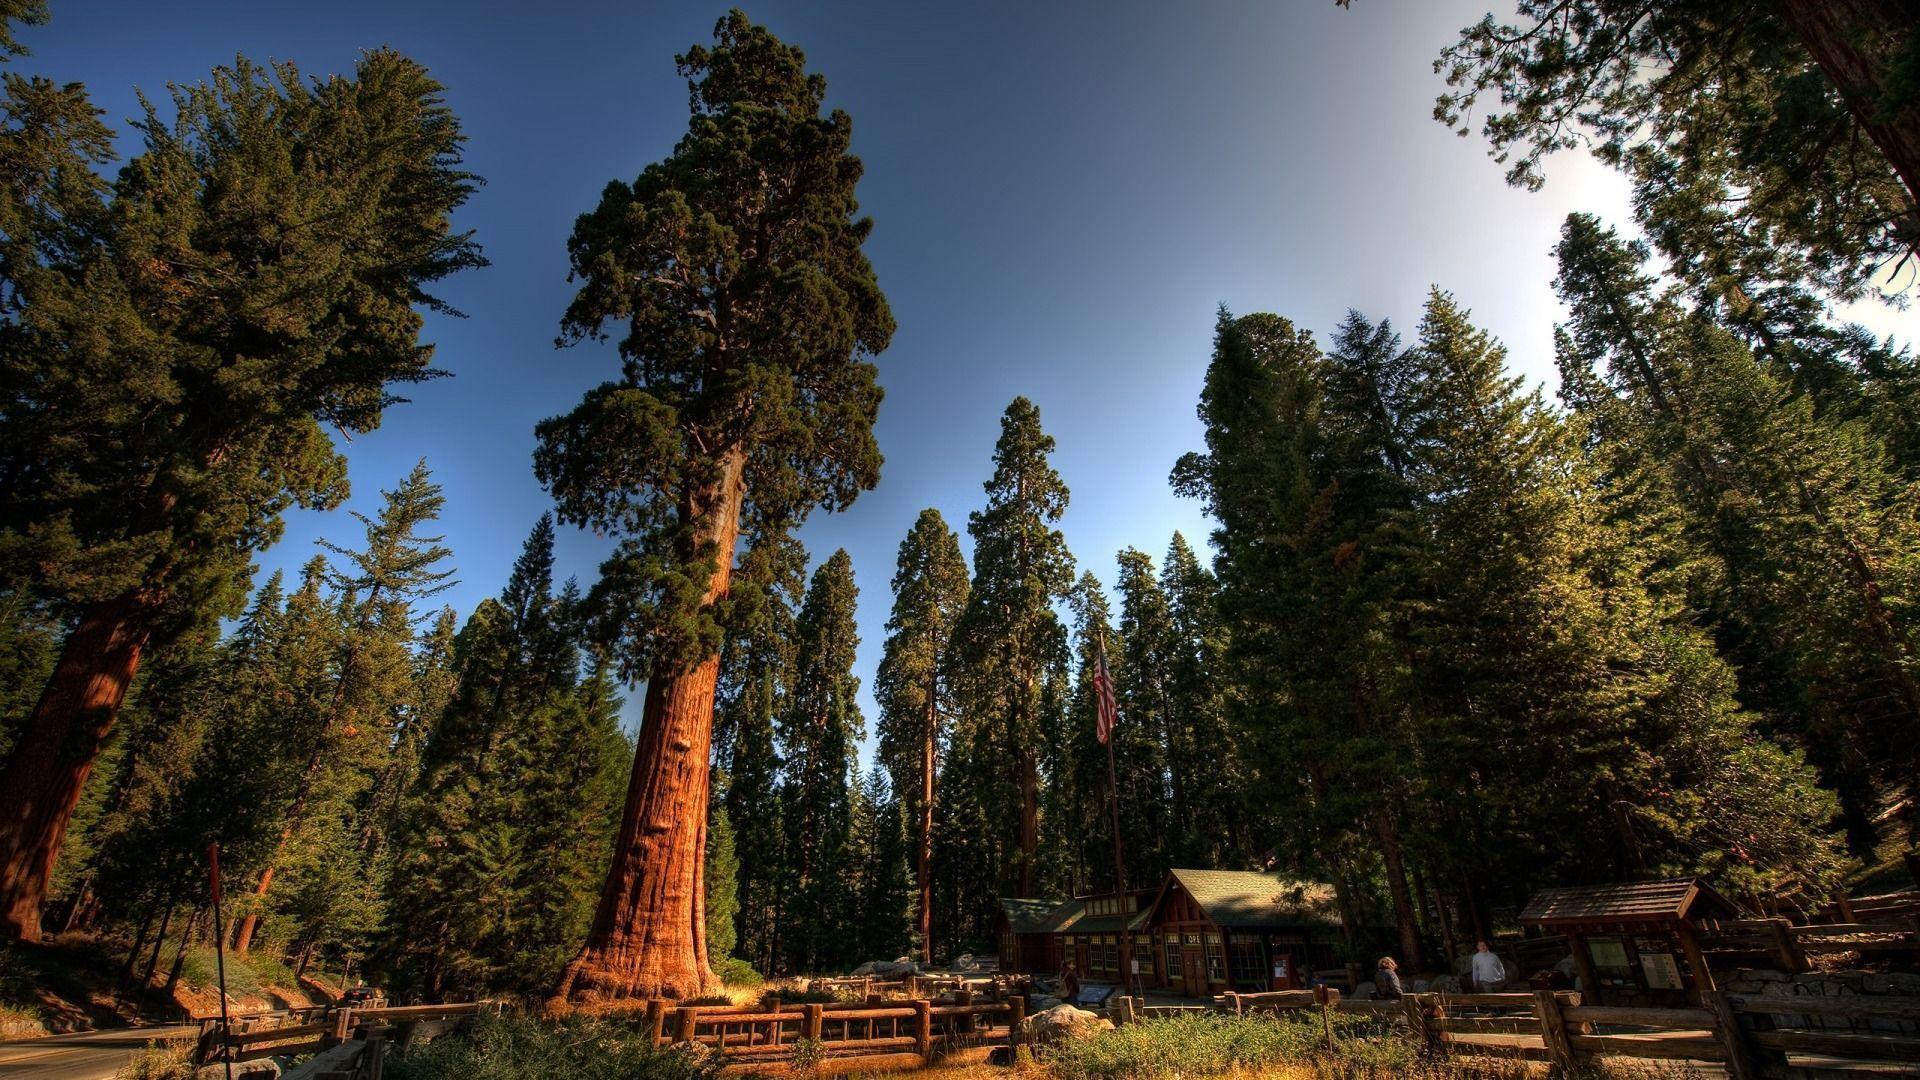 4k wallpaper nature redwoods - photo #7